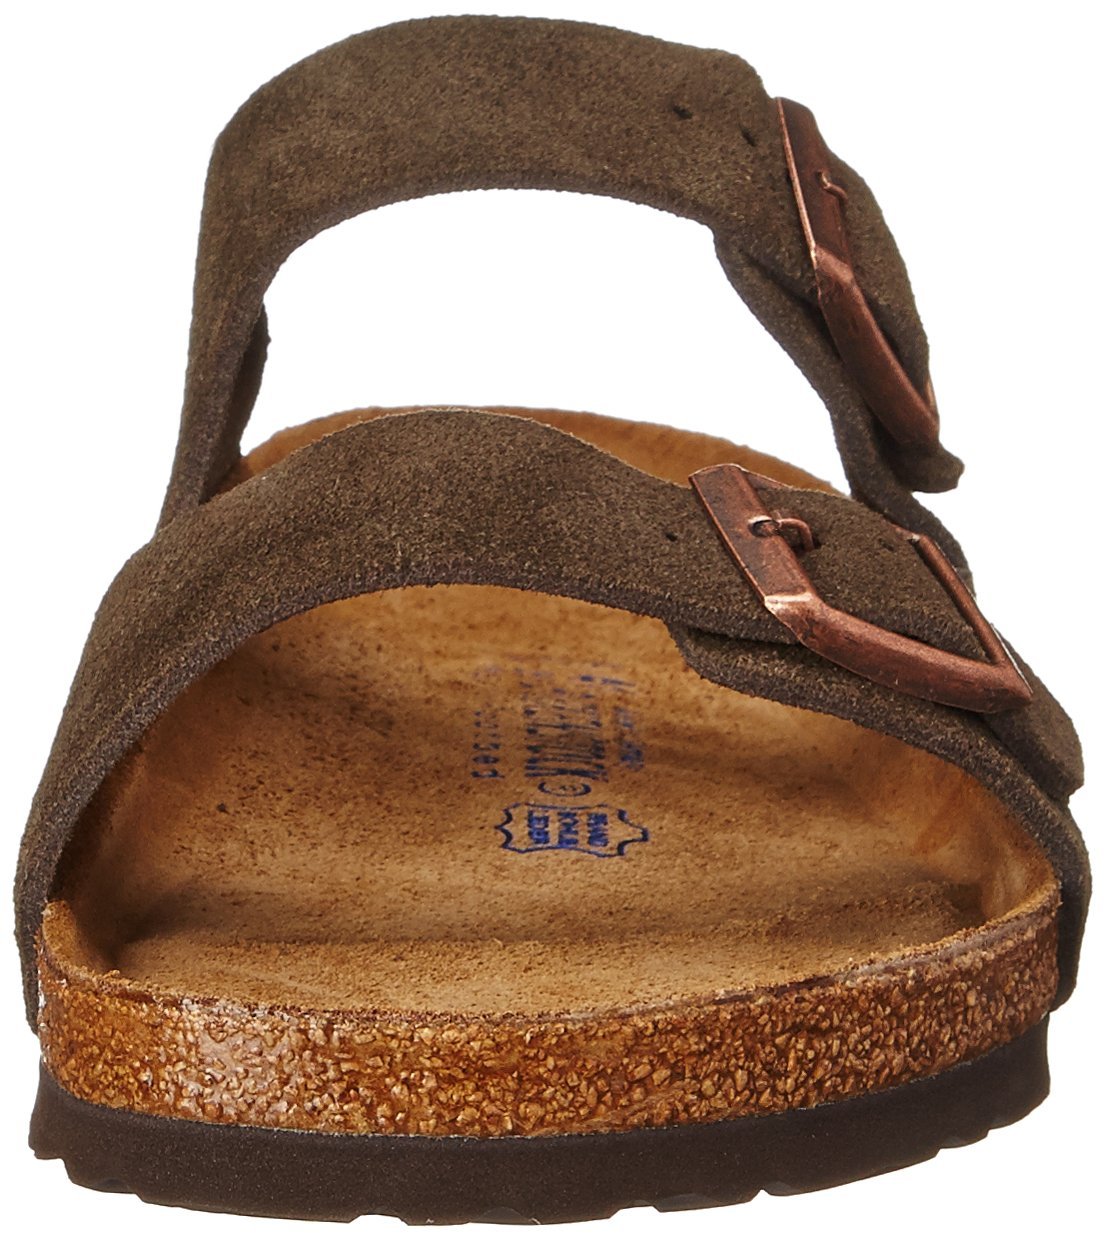 Birkenstock Unisex Arizona Mocha Suede Sandals - 35 N EU / 4-4.5 2A(N) US by Birkenstock (Image #4)